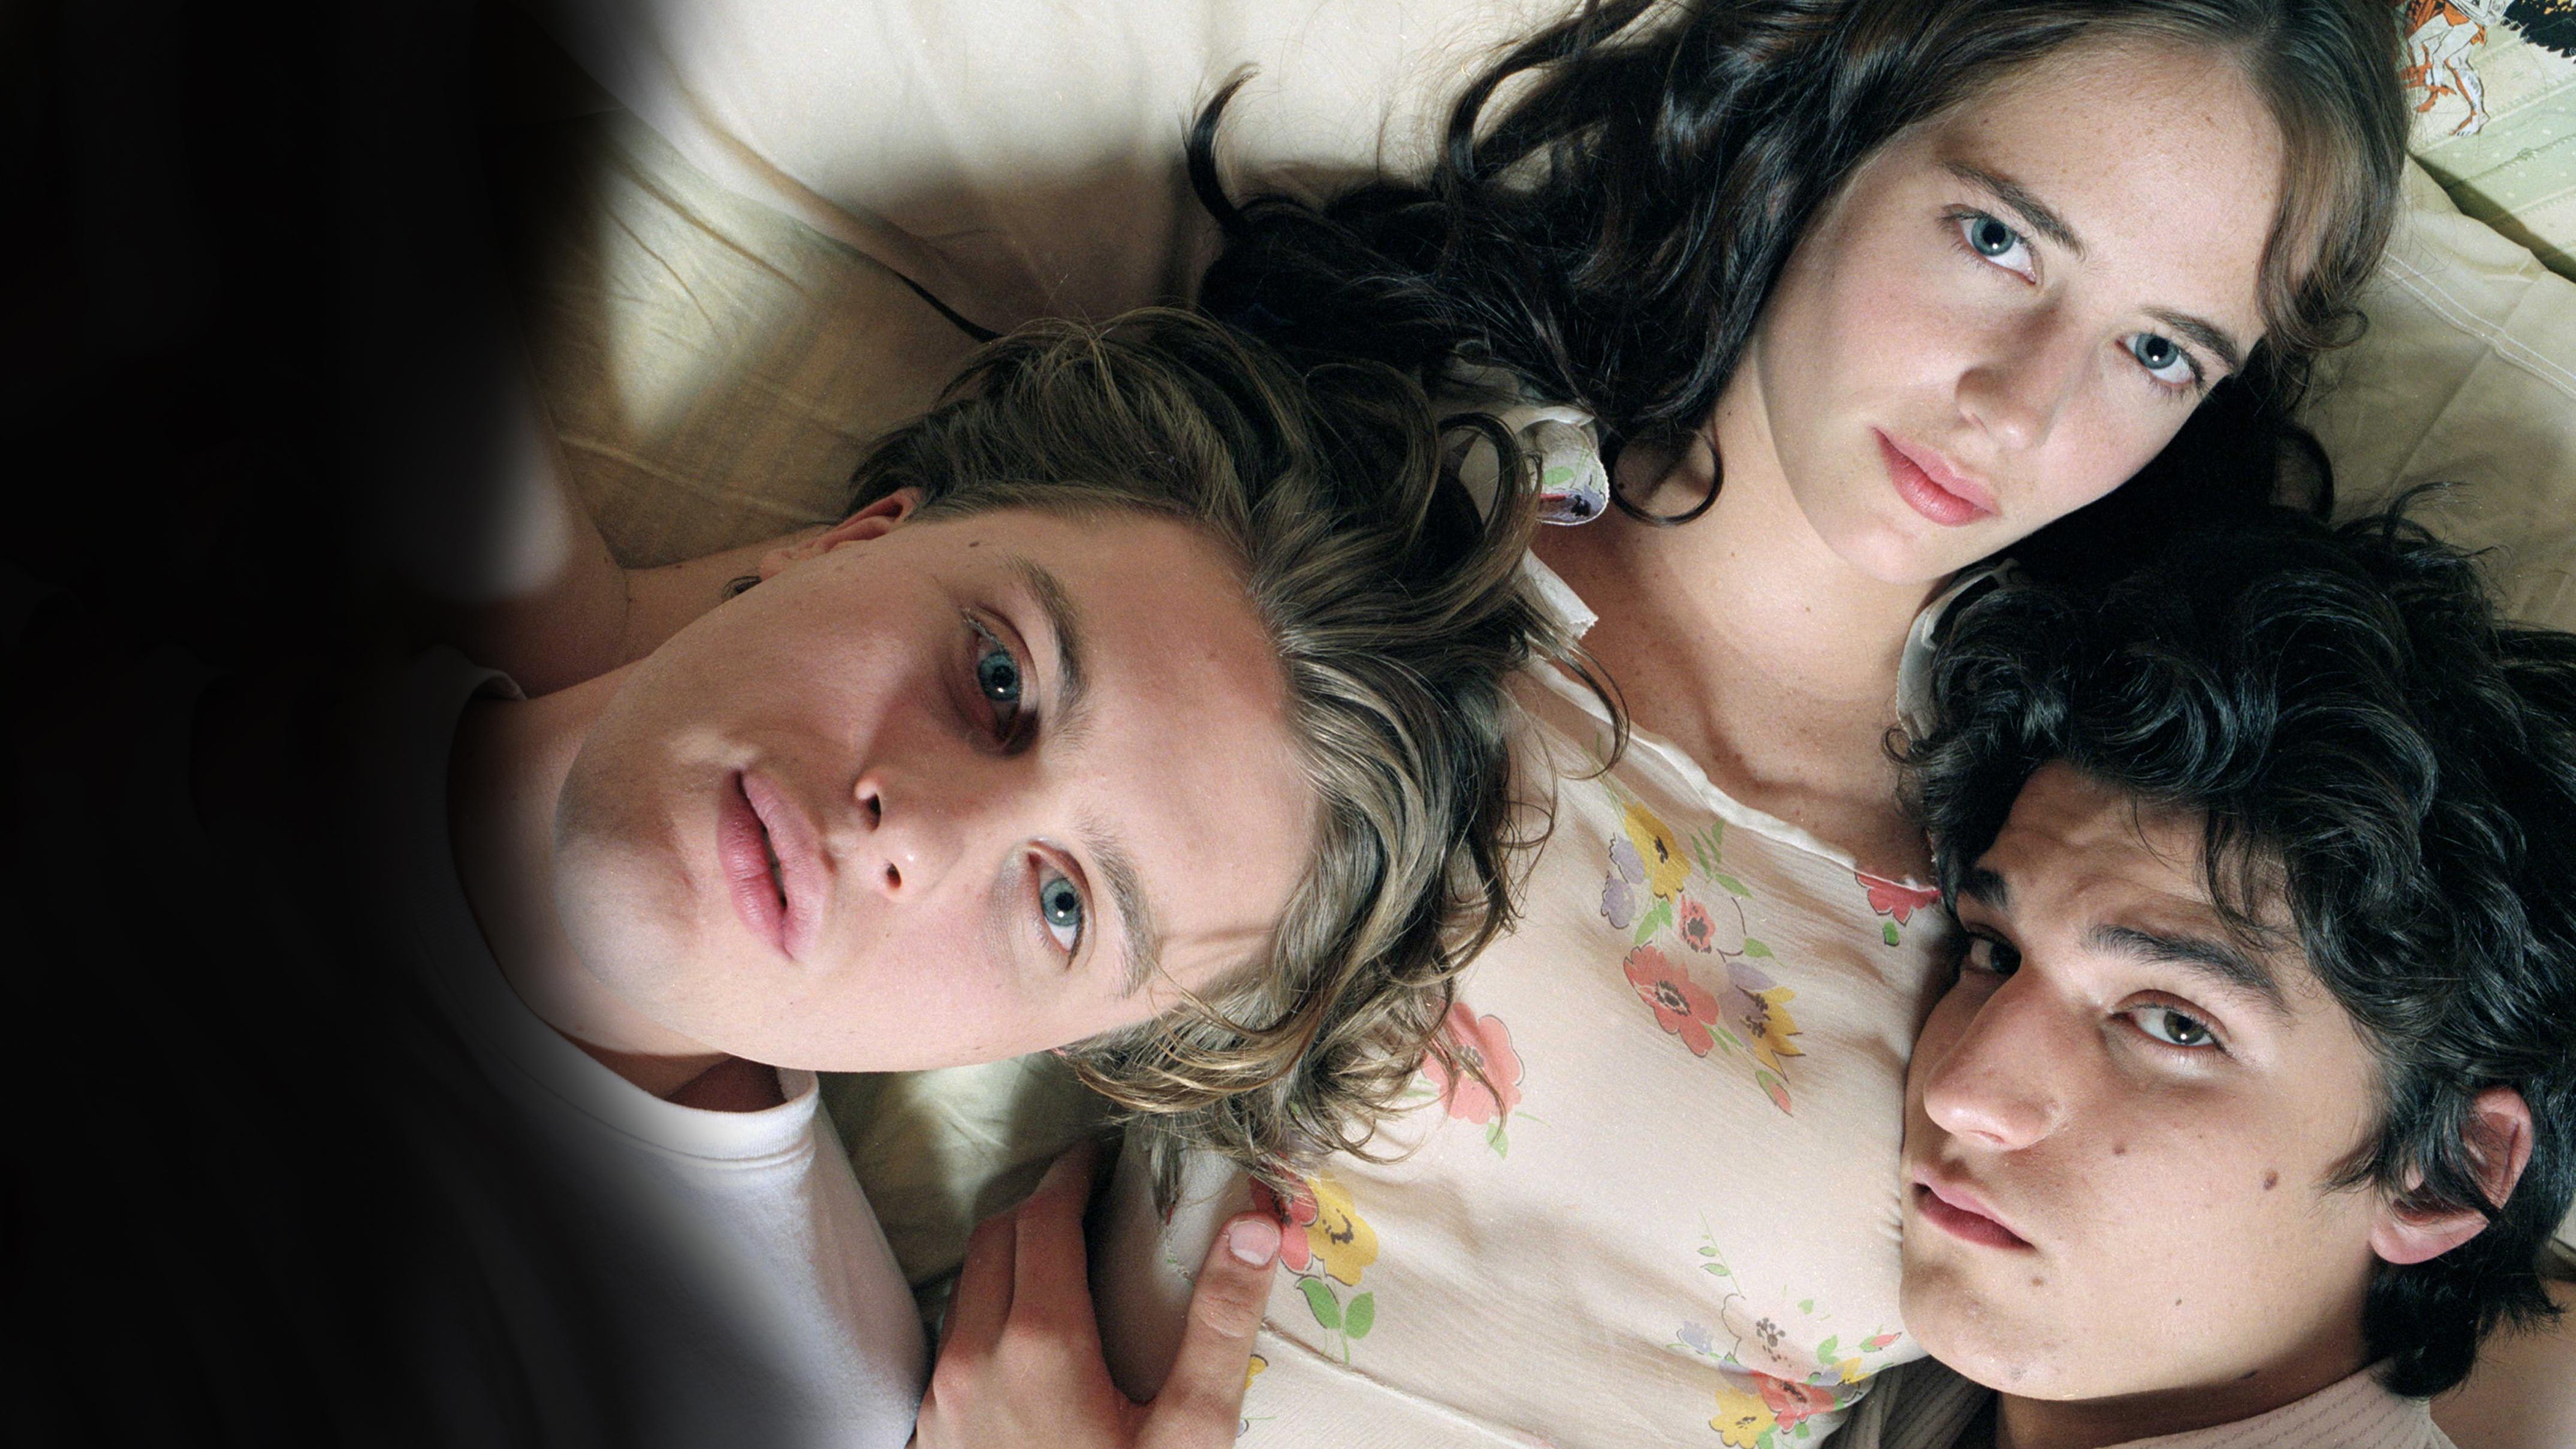 Фильм о сексе мечтатели